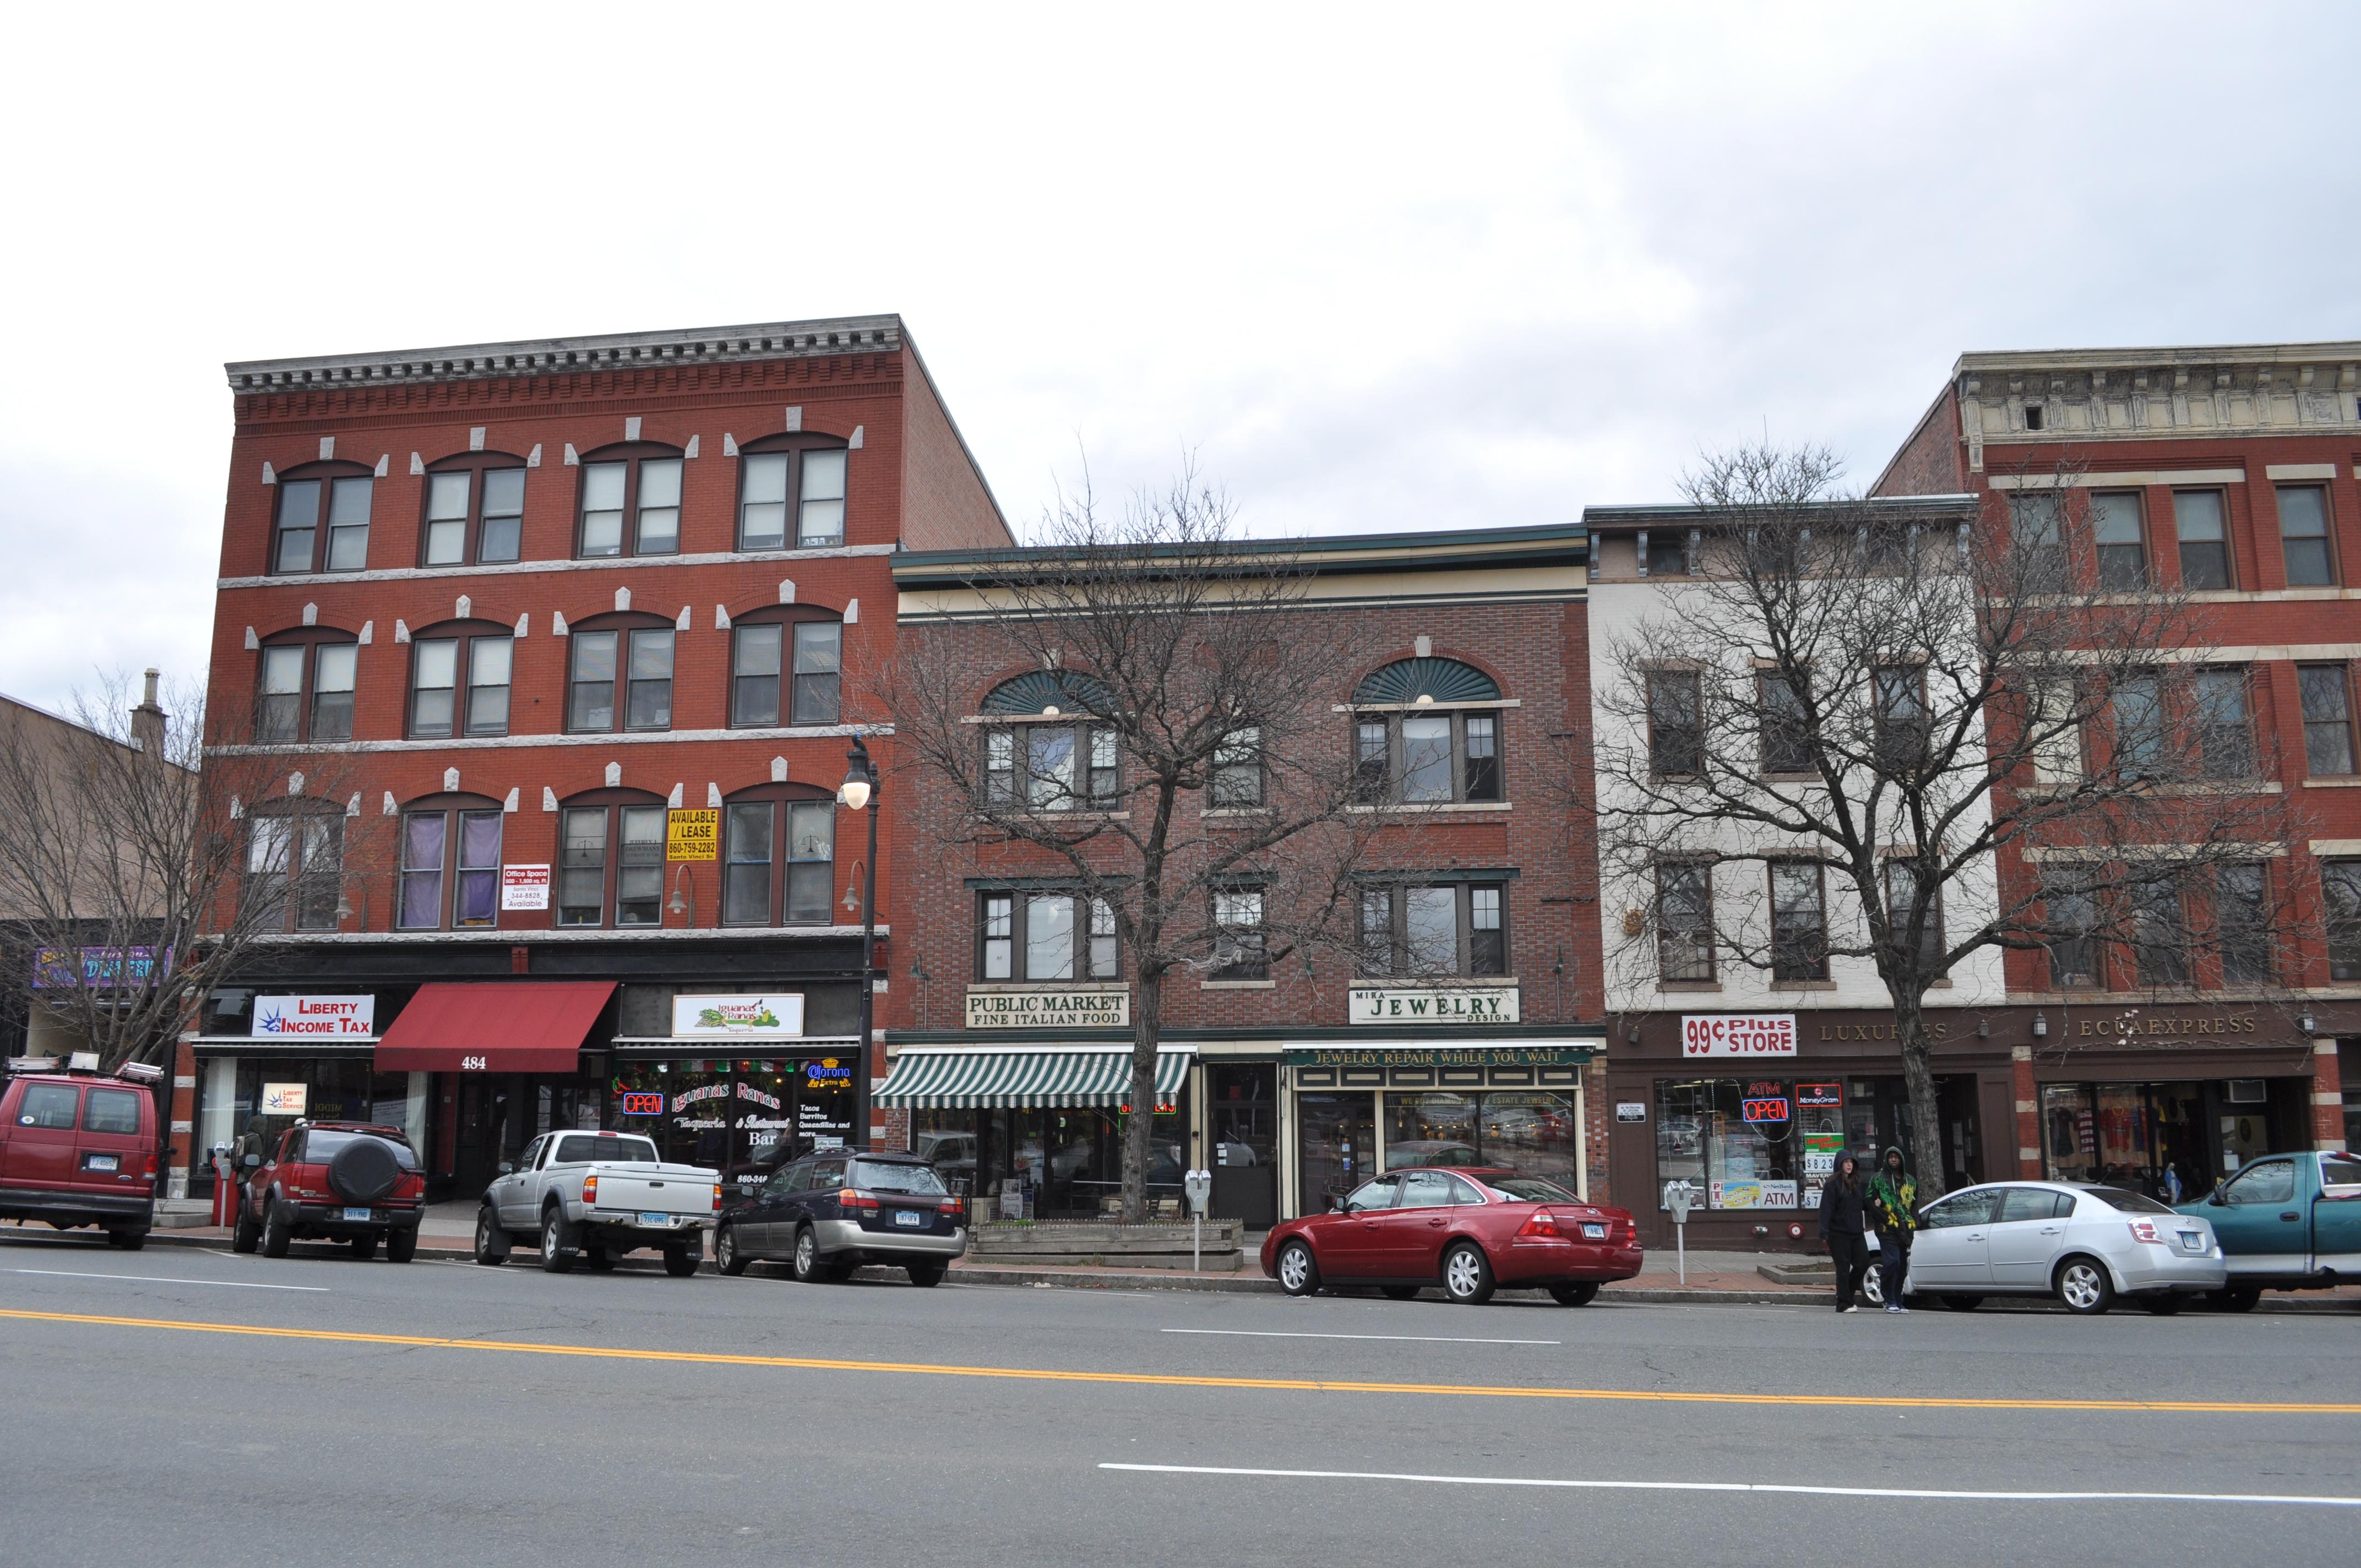 File:Middletown, CT - Main Street Market building 01.jpg ...